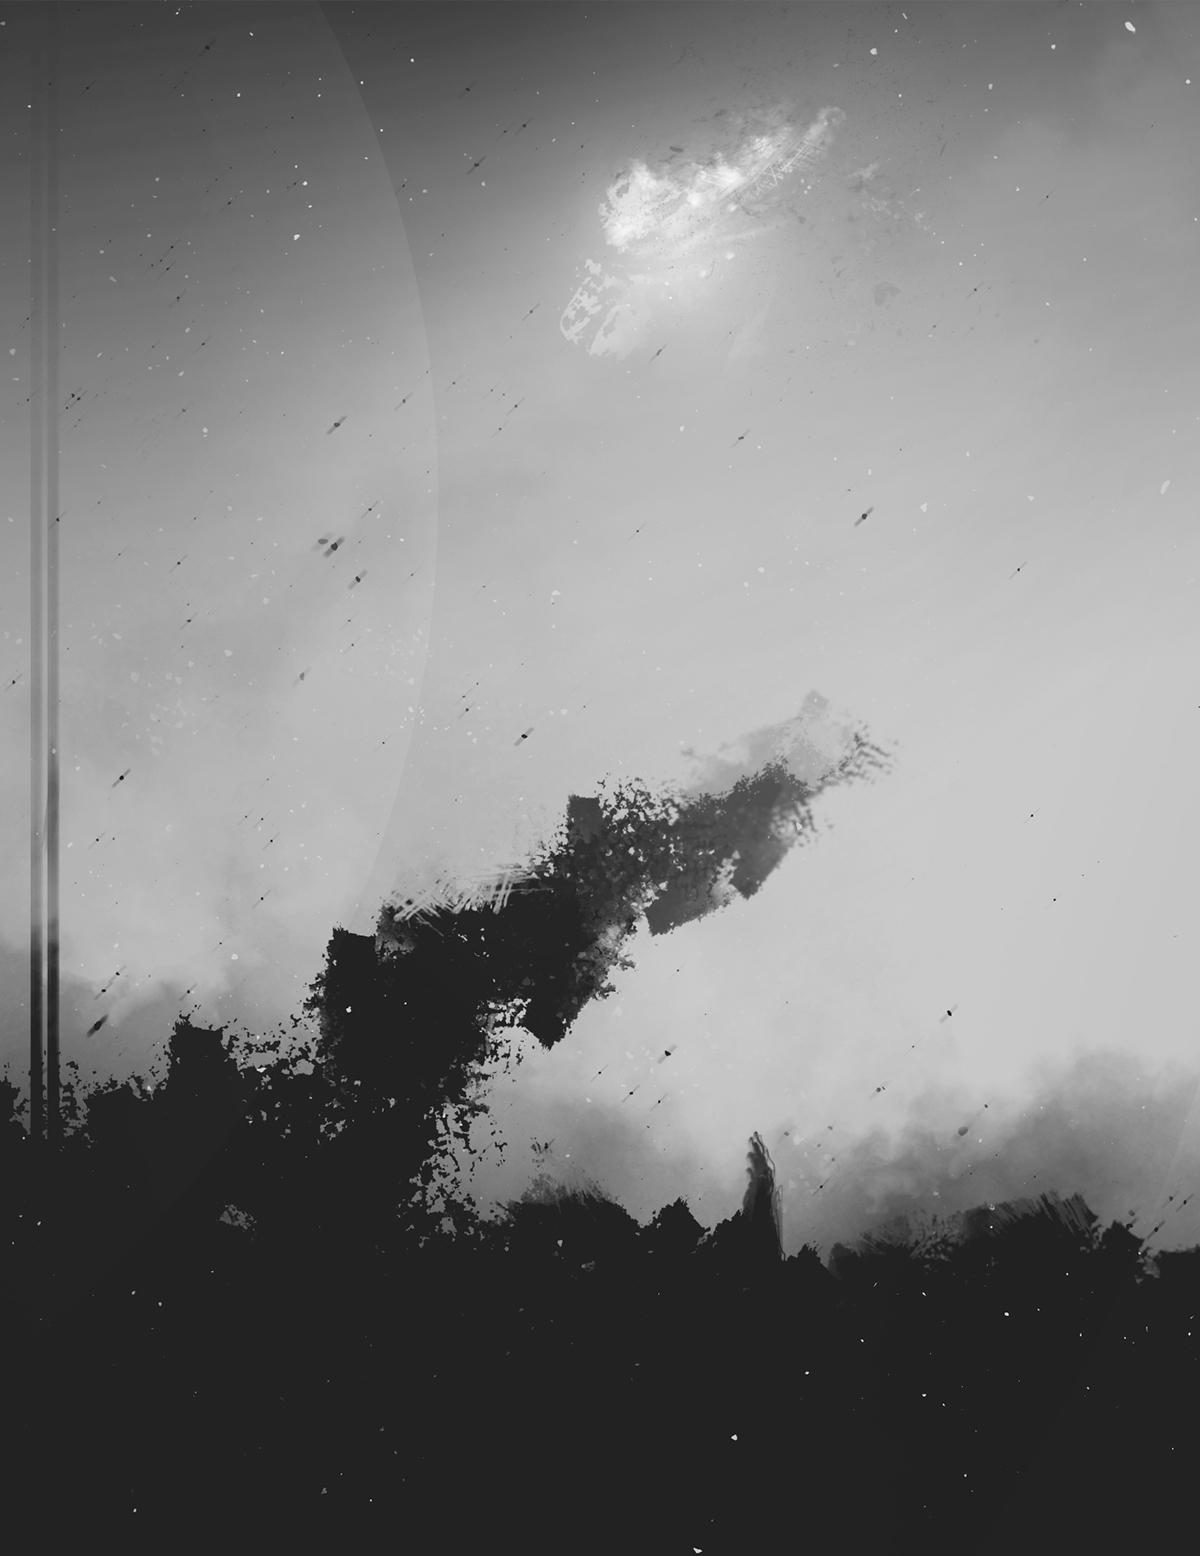 Landscape monochrome black and white Sun DISTORTED dust stars galaxy dark empny lonely pessimistic